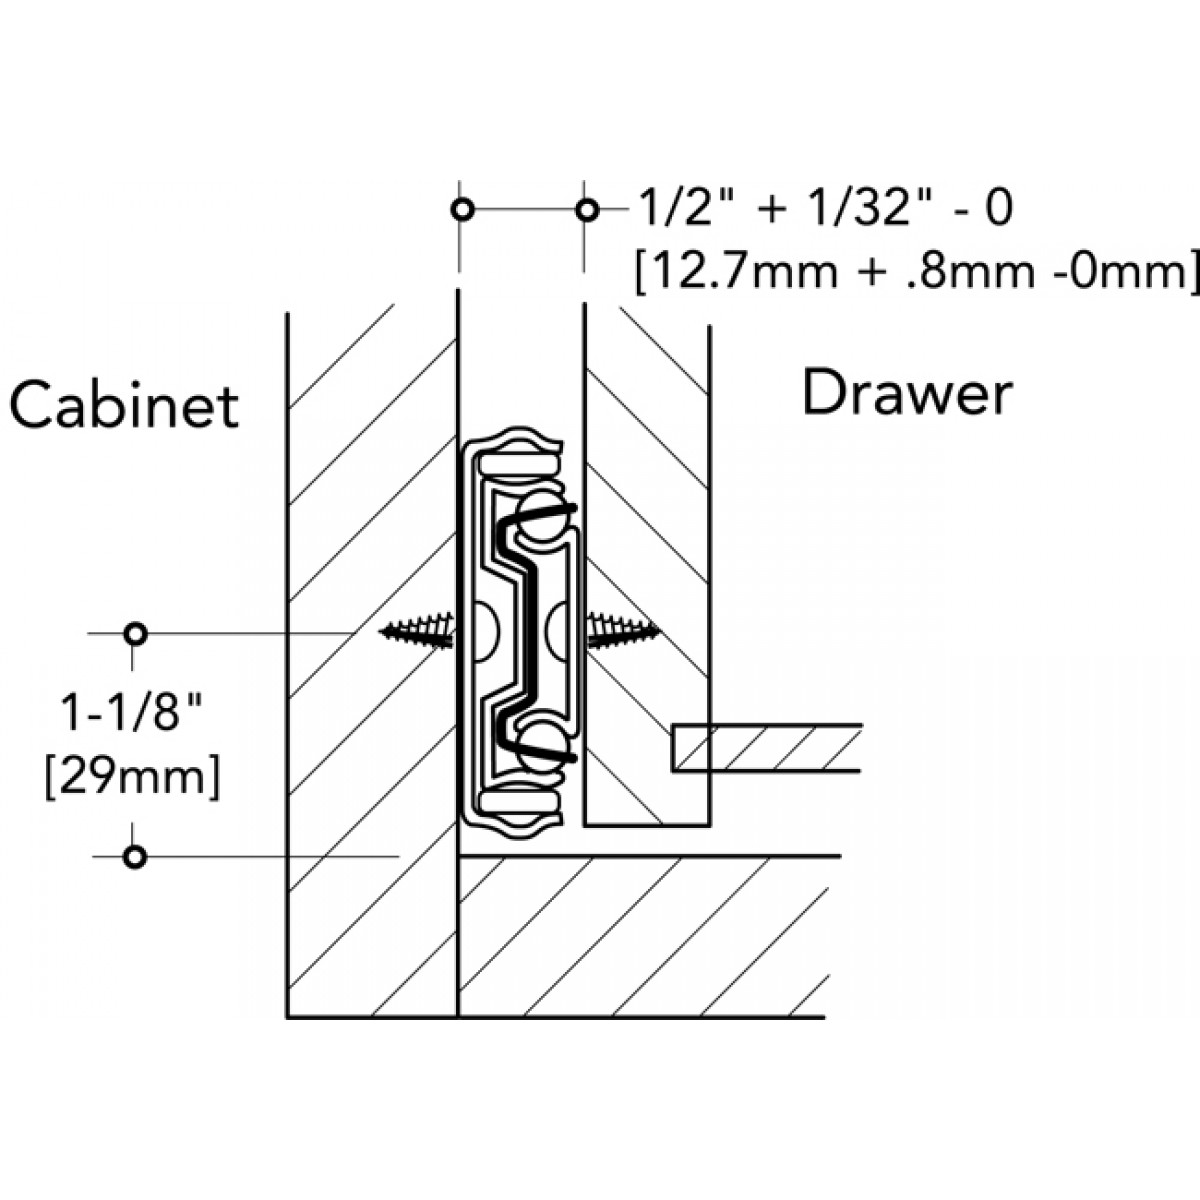 inch mount slide china pbvnezaybprj product slides drawer bottom rails drawers